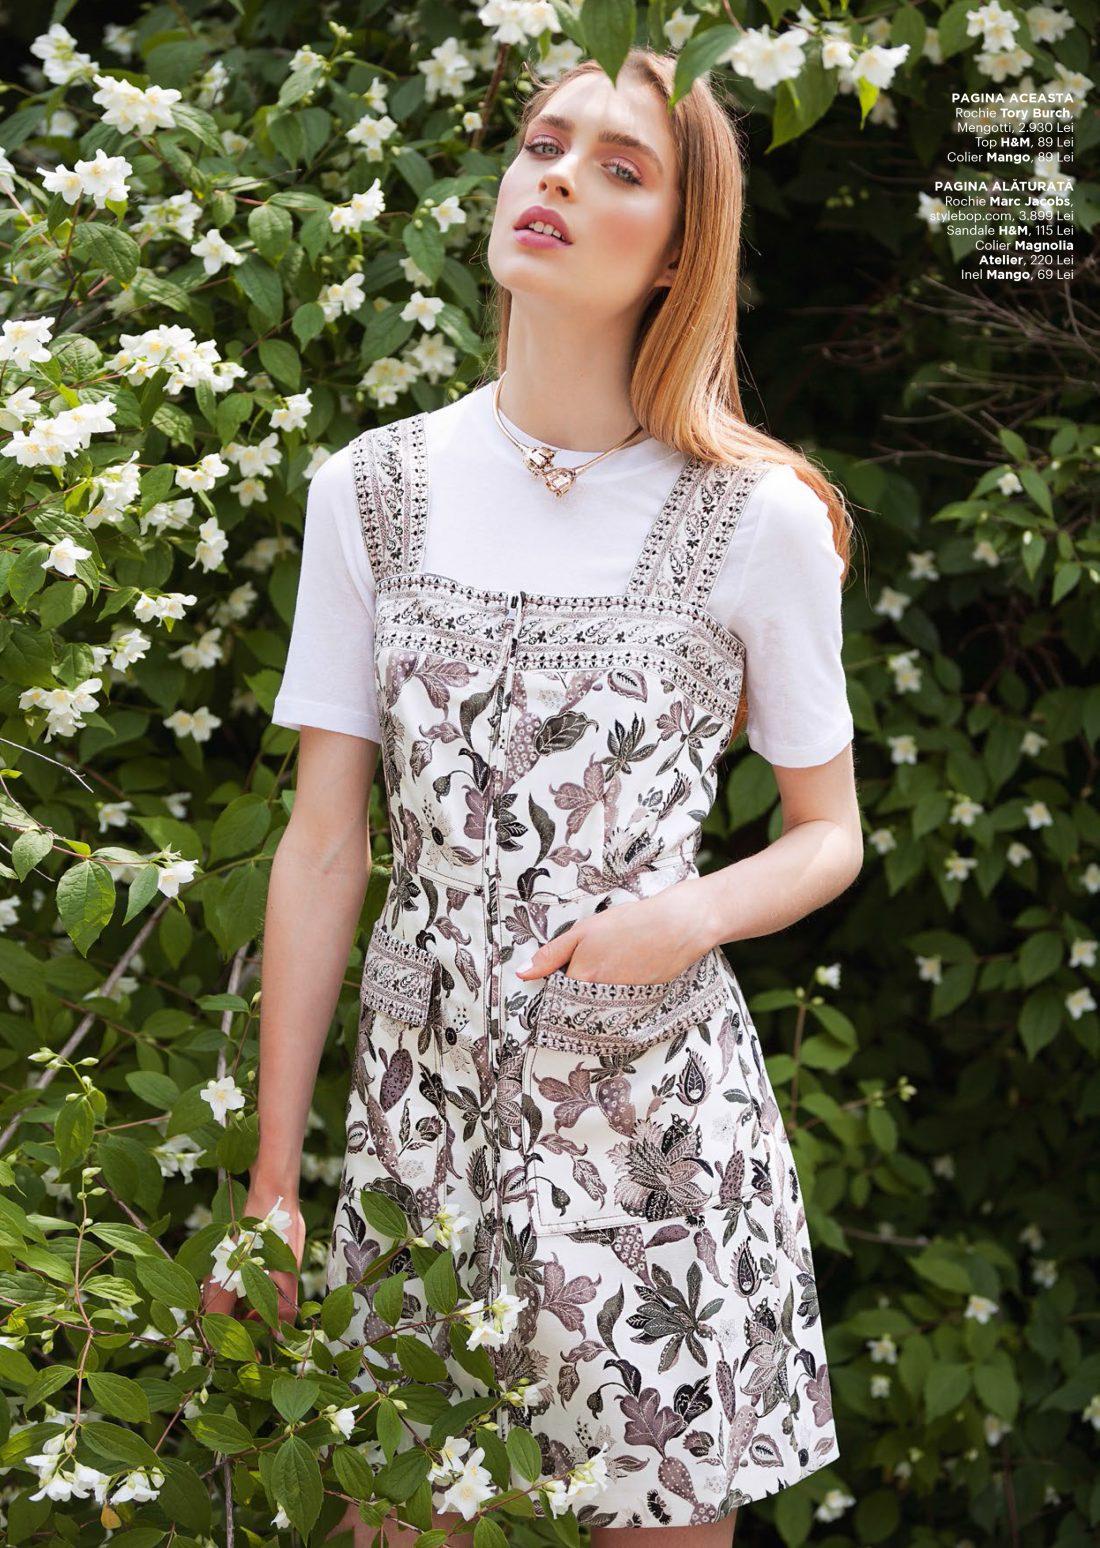 Harper's Bazaar - Idila de-o vara | Tania Cozma make-up